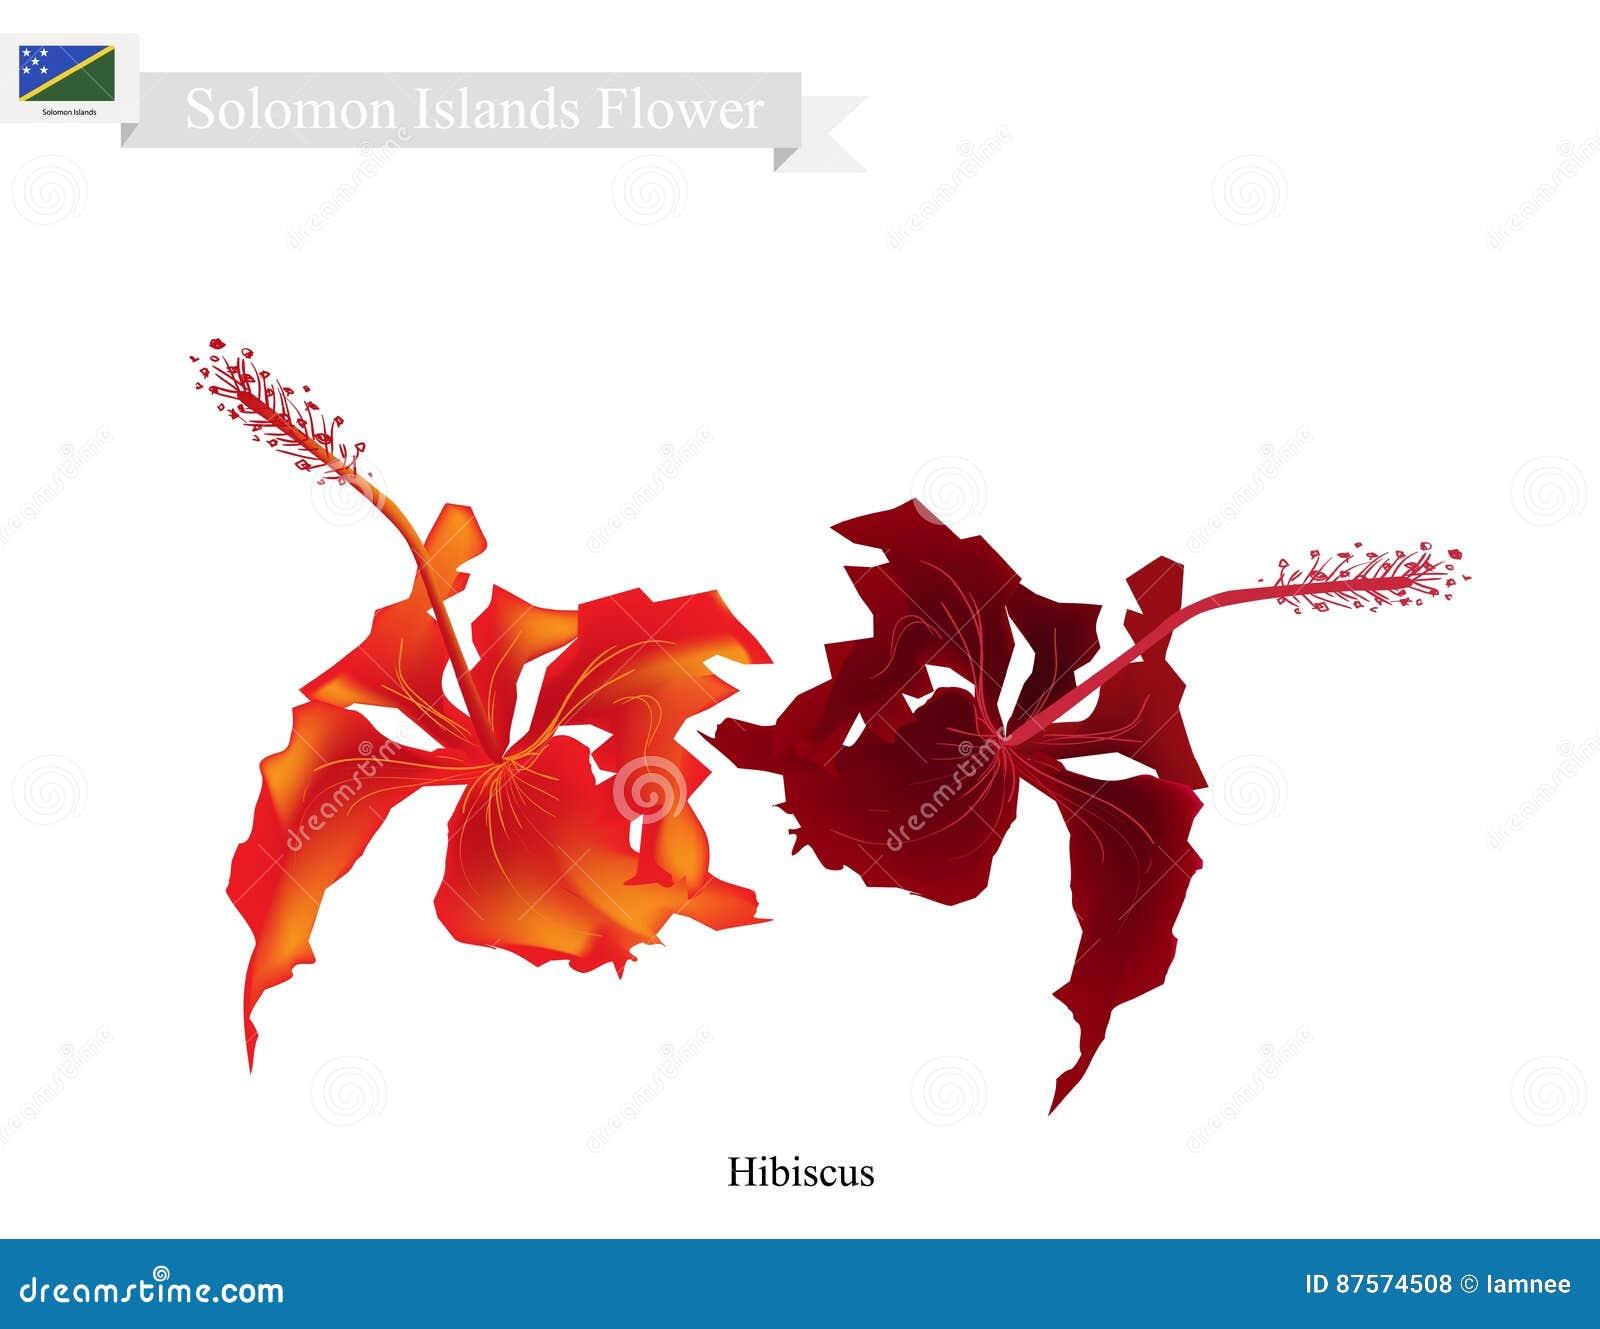 National flower of solomon the hibiscus flowers stock vector national flower of solomon the hibiscus flowers izmirmasajfo